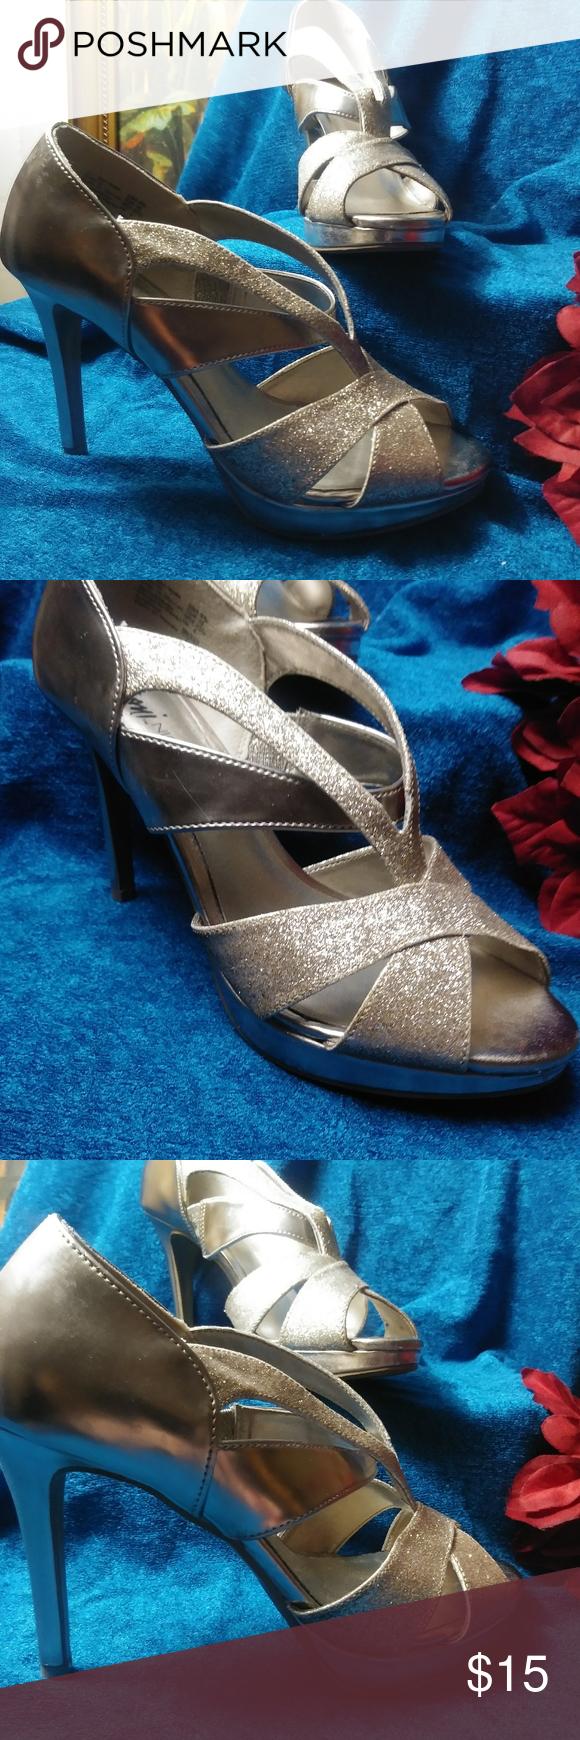 🎄GOLD GLITTER STRAPPY HEELS 👠 WORN ONCE!! Beautiful glitzy GOLD heels. WOR... 7